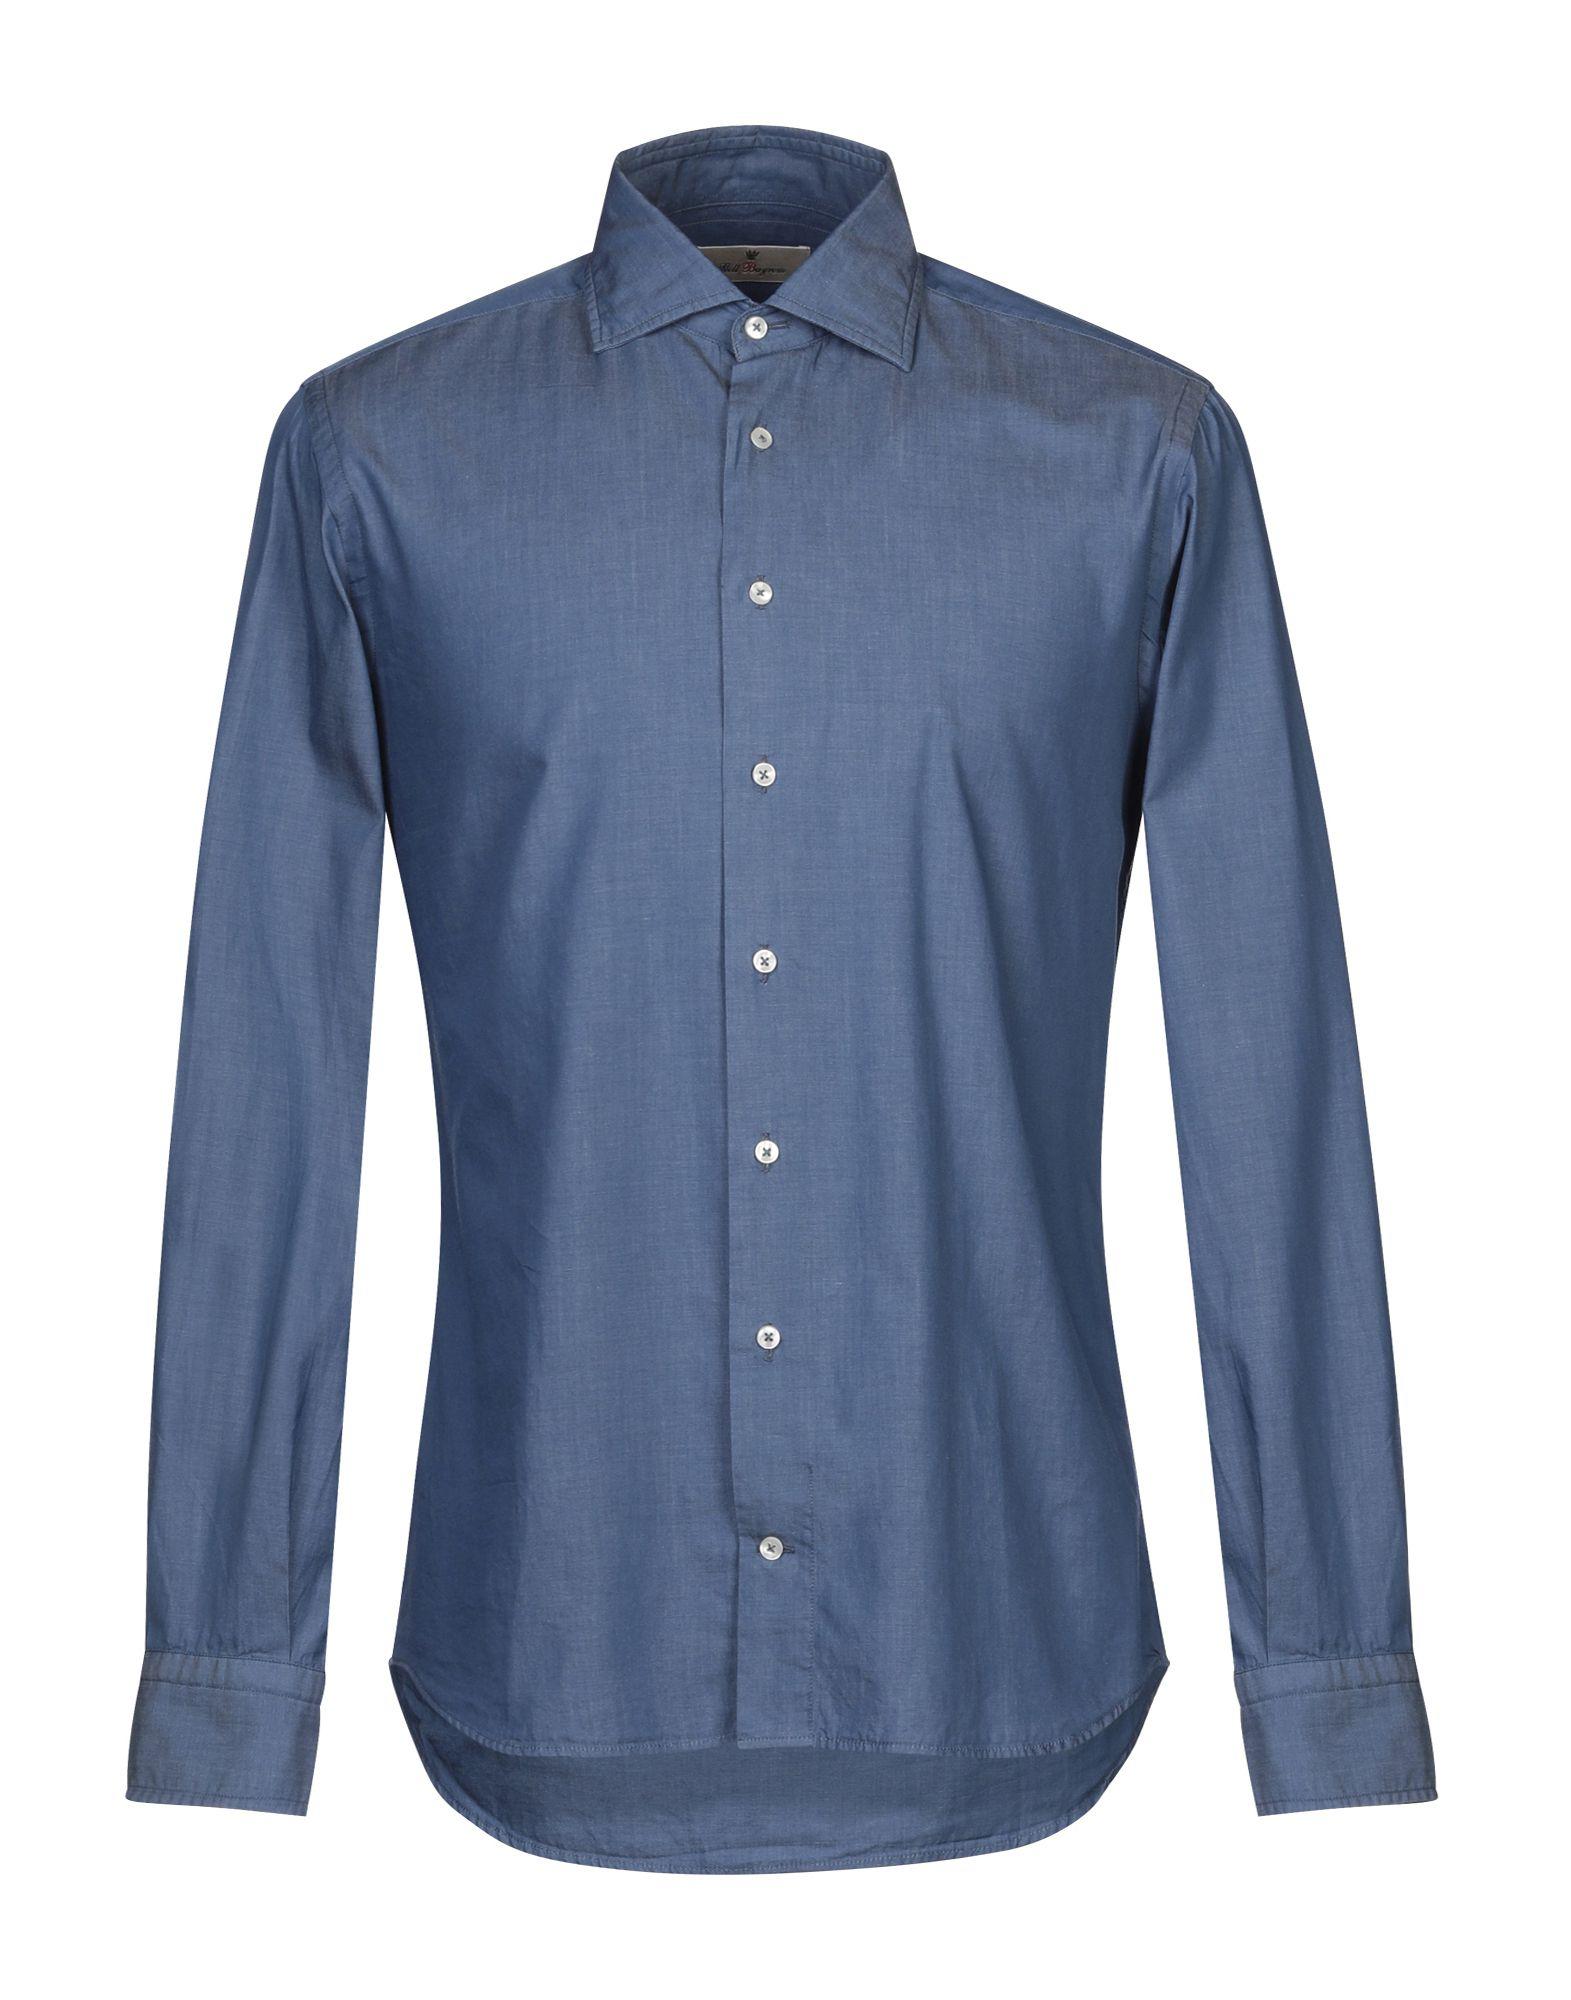 STELL BAYREM Джинсовая рубашка